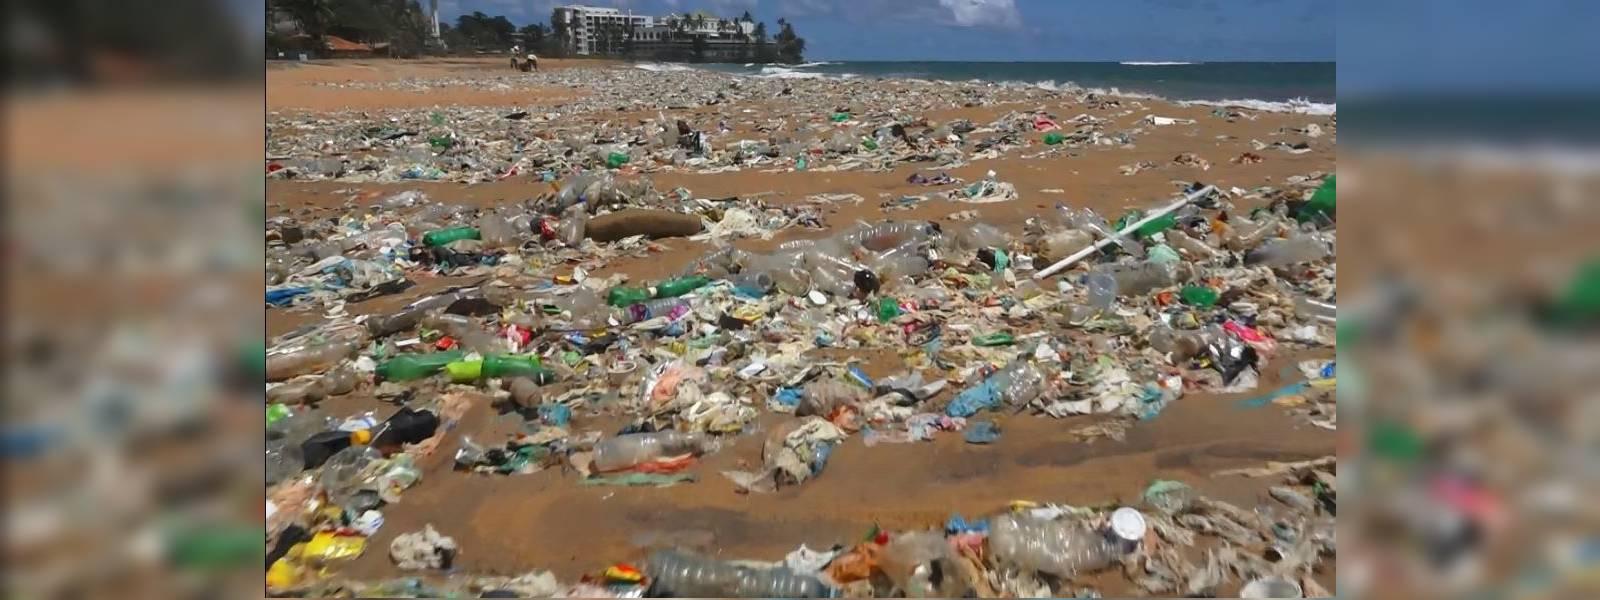 Police probe washing up of waste on Mount Lavinia beach